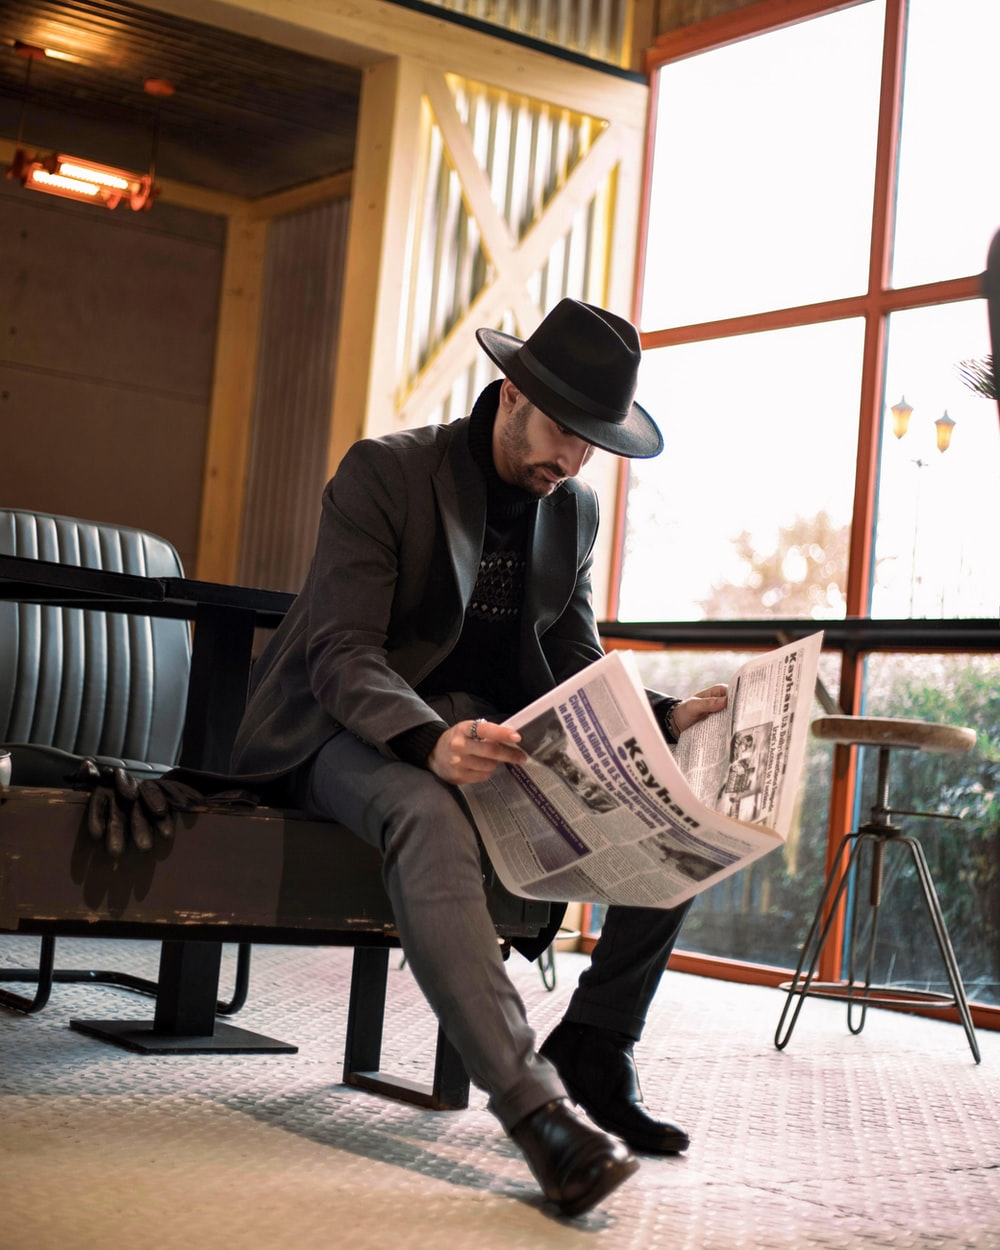 man in black suit jacket and black fedora hat reading newspaper